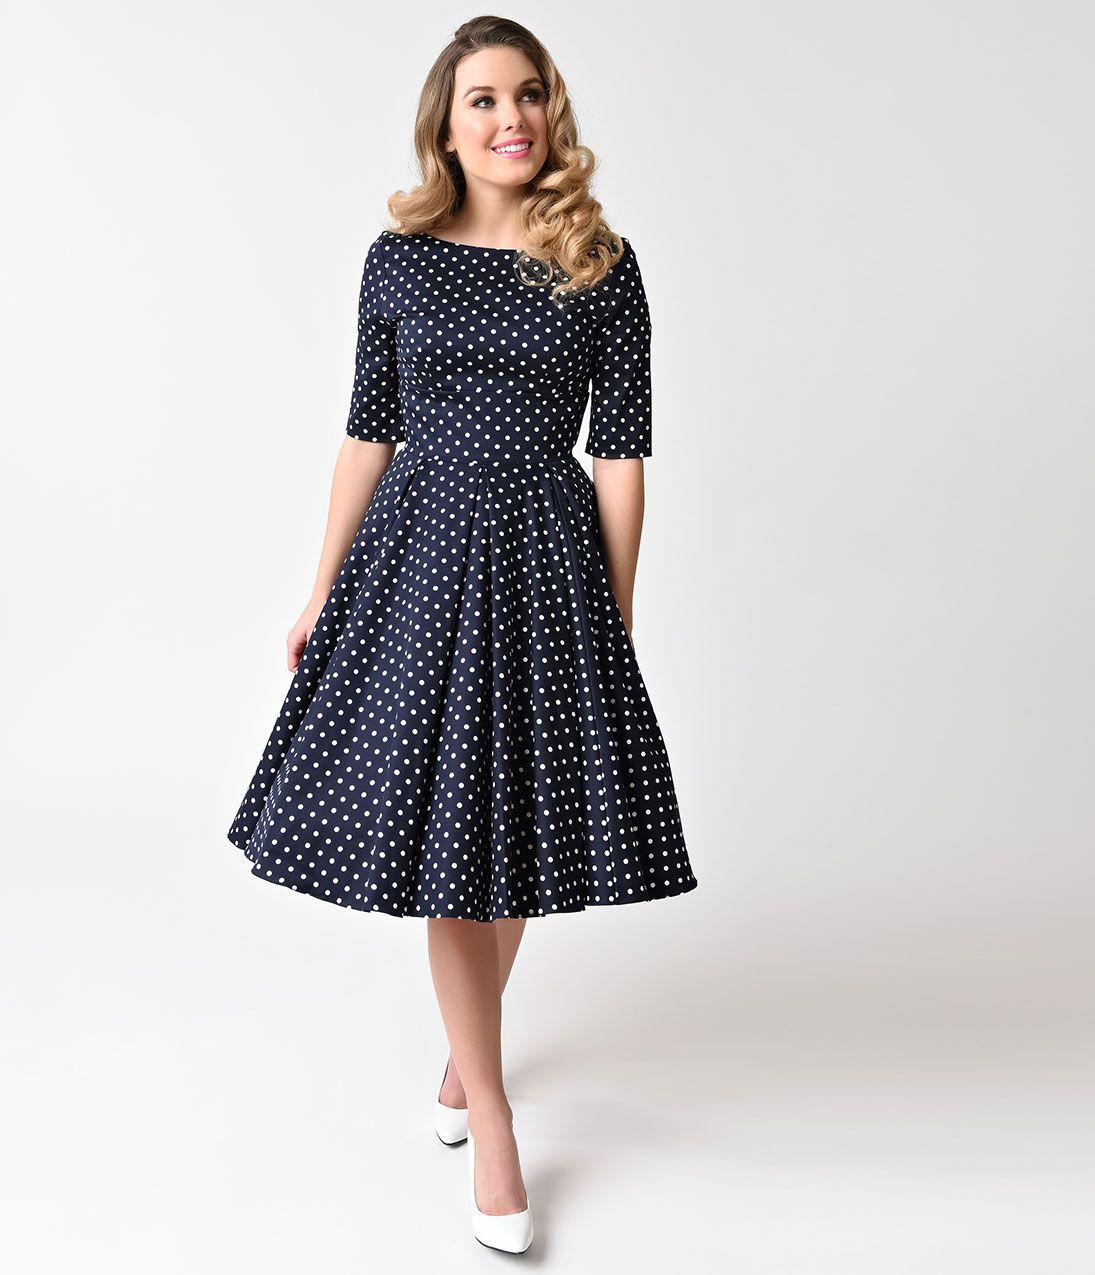 60s Dresses 1960s Dresses Mod Mini Hippie Swing Dress Vintage Dresses Prom Dresses Vintage [ 1275 x 1095 Pixel ]